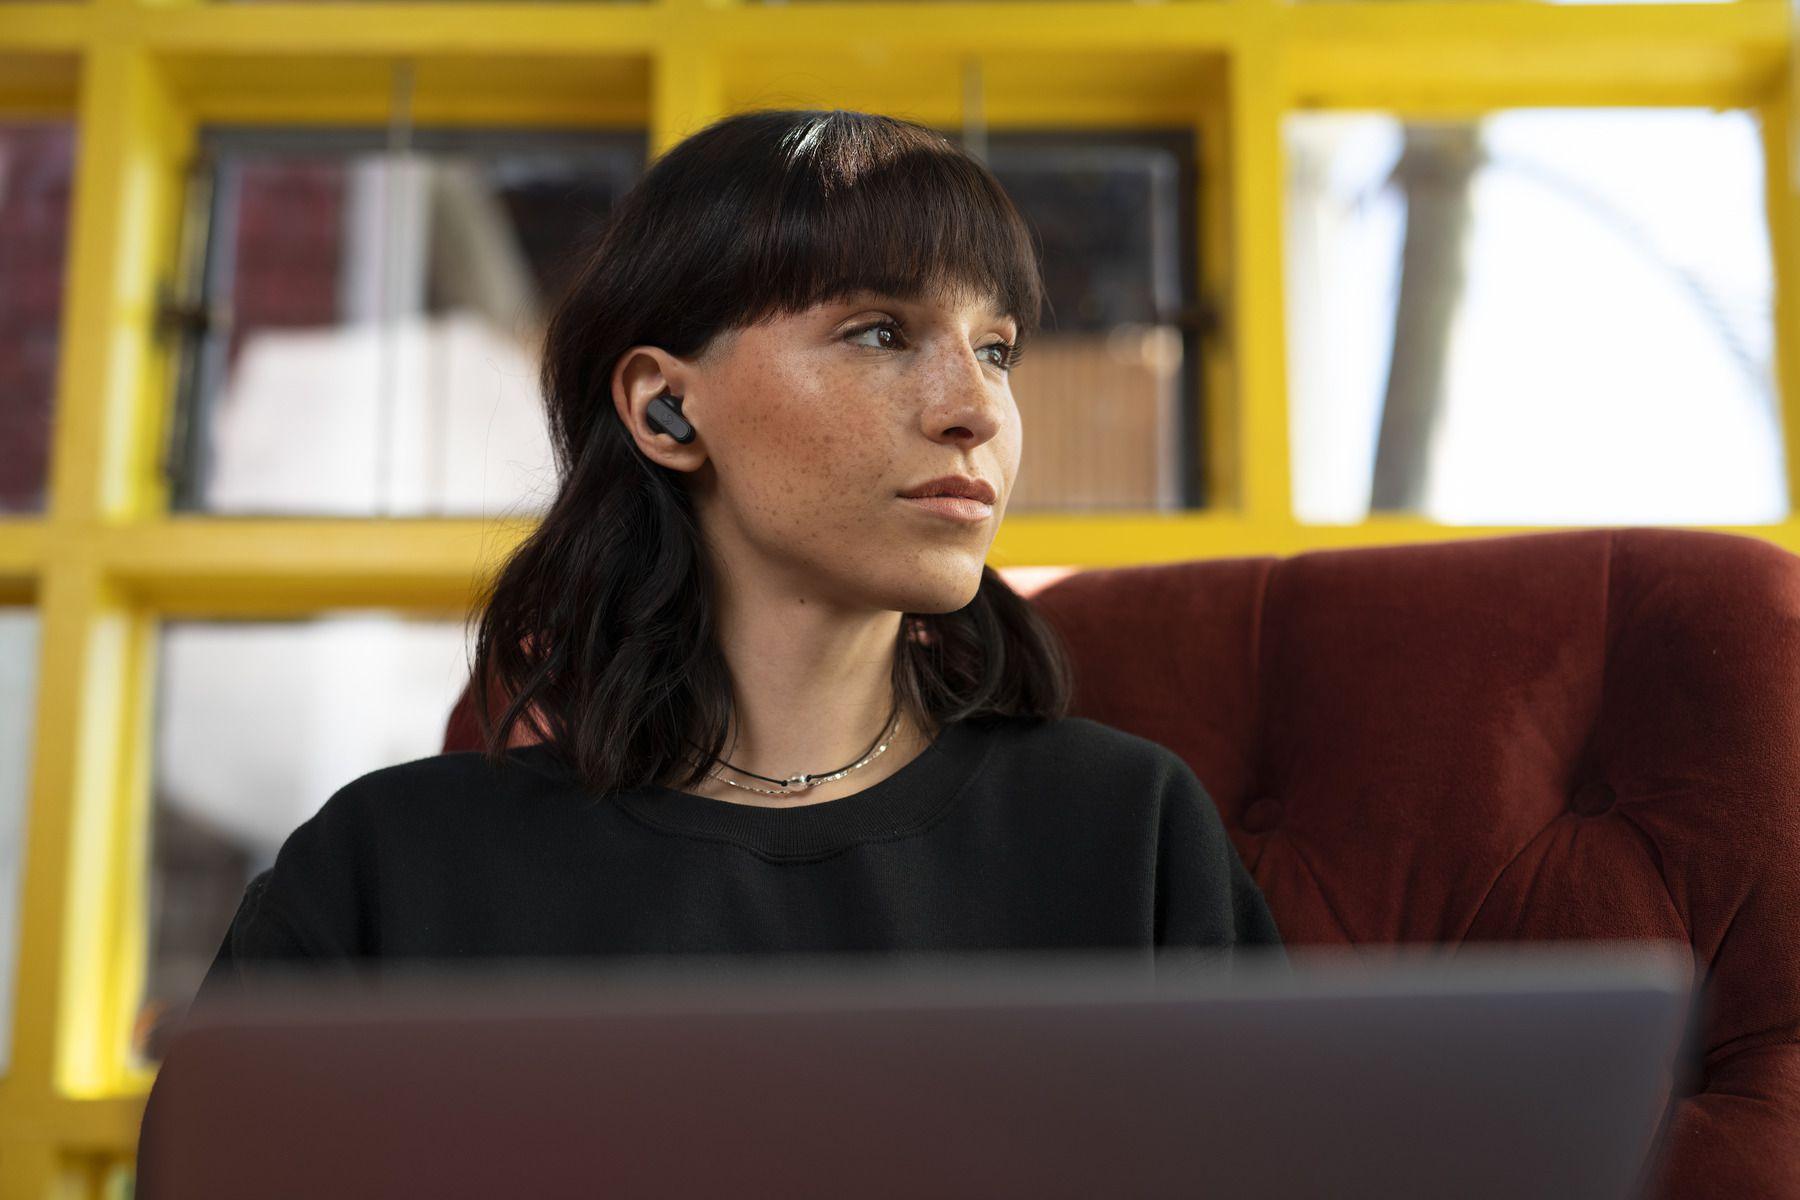 Woman wearing Skullcandy Dime earbuds